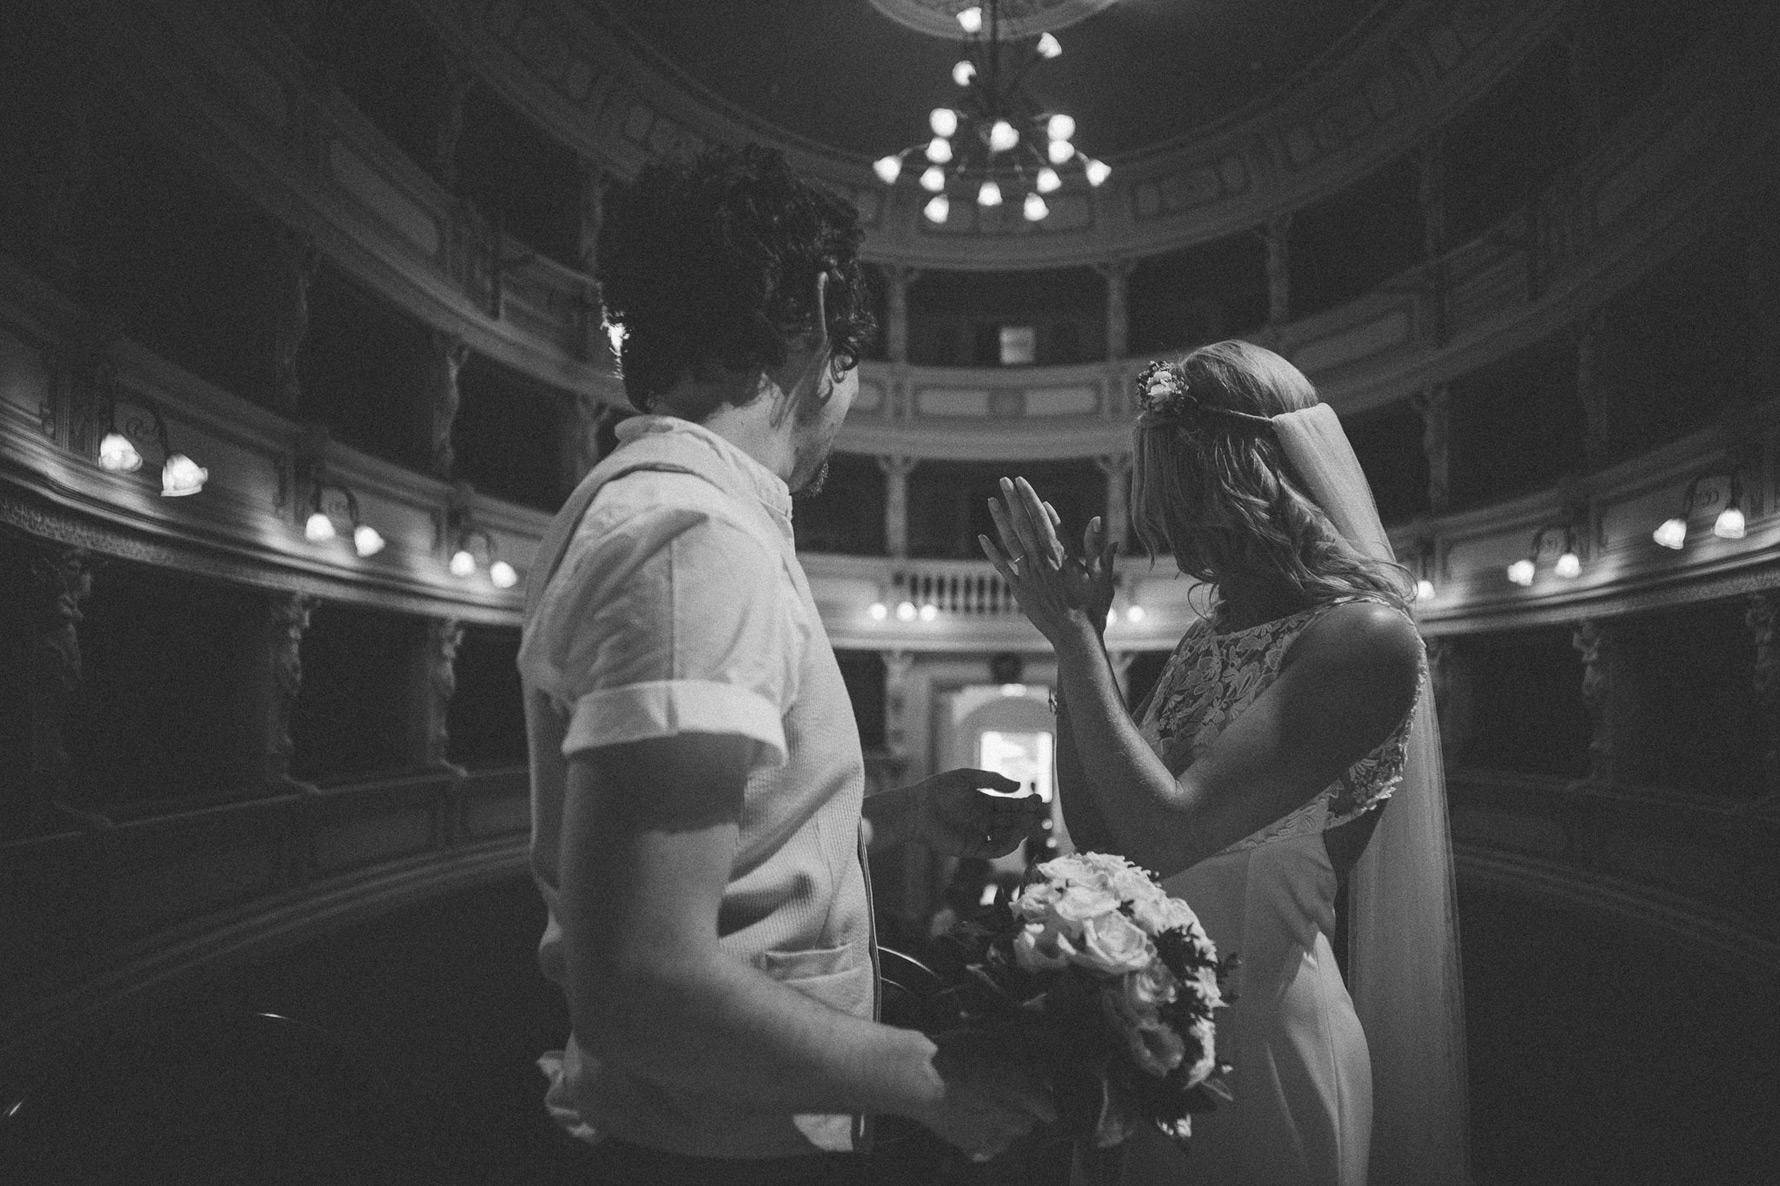 arrischiatti-theathre-wedding-photographer-livio-lacurre-photography